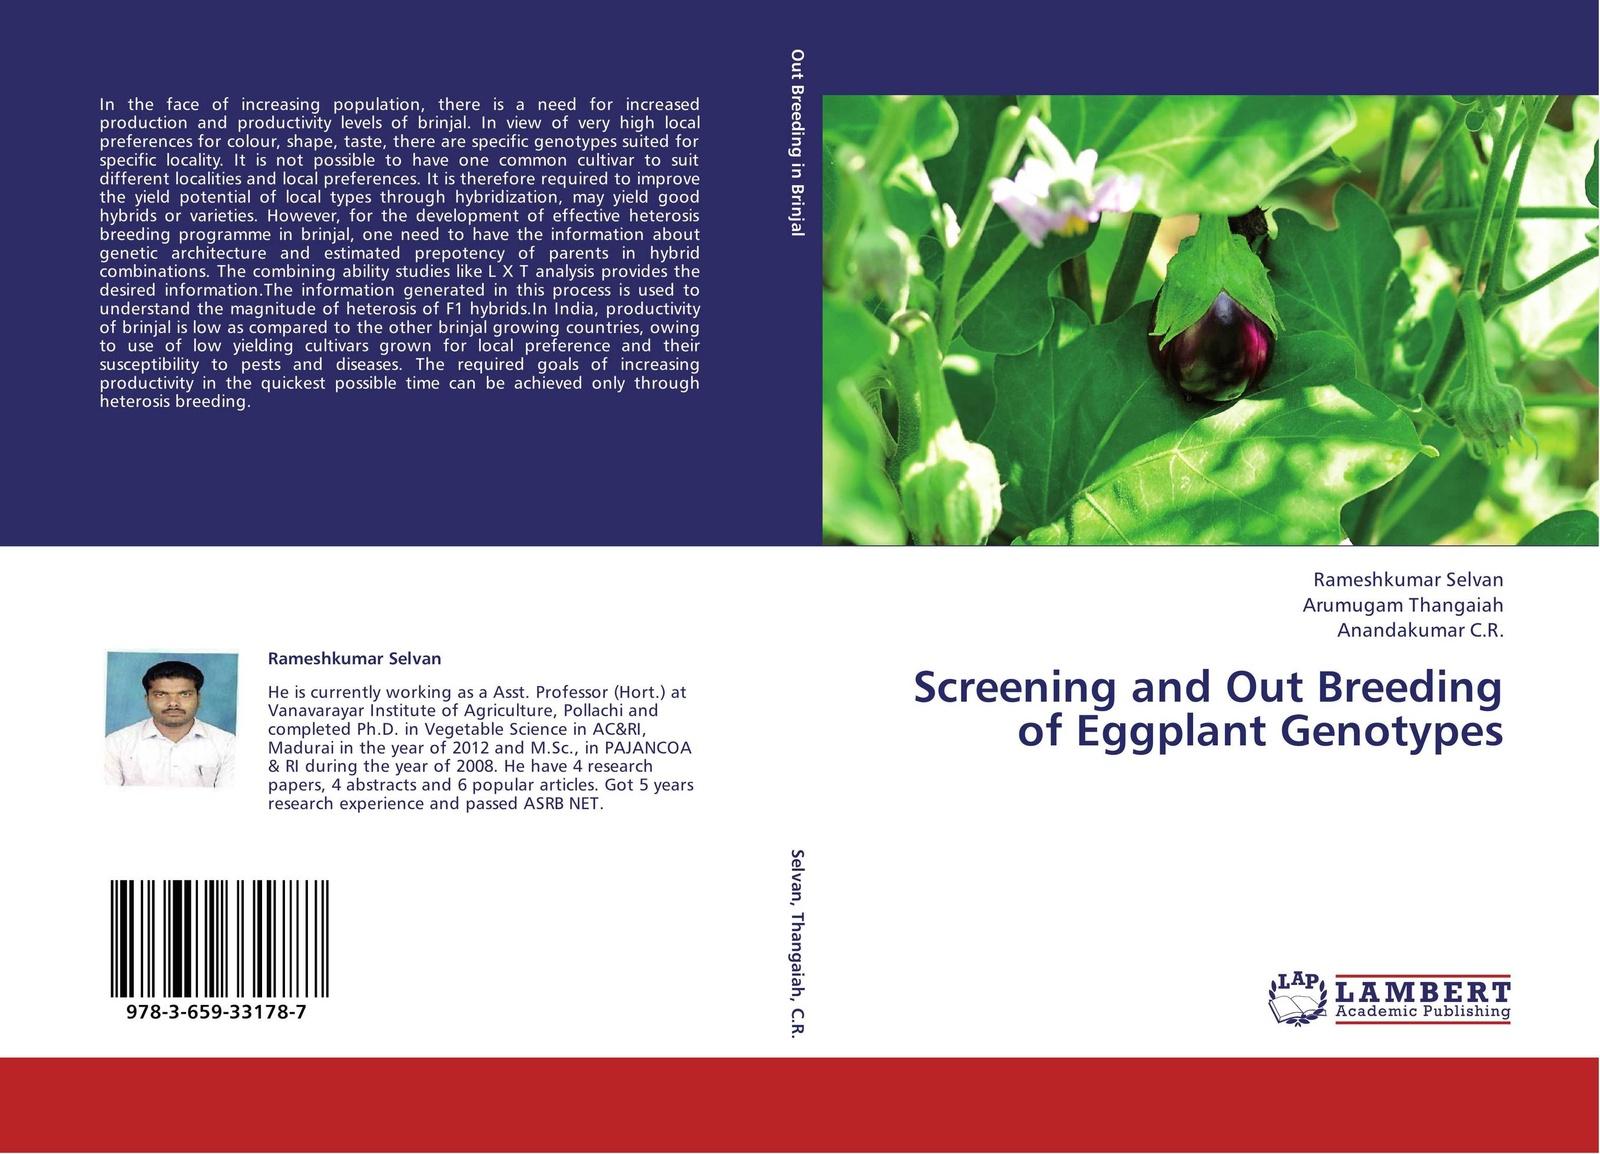 Rameshkumar Selvan,Arumugam Thangaiah and Anandakumar C.R. Screening and Out Breeding of Eggplant Genotypes недорго, оригинальная цена